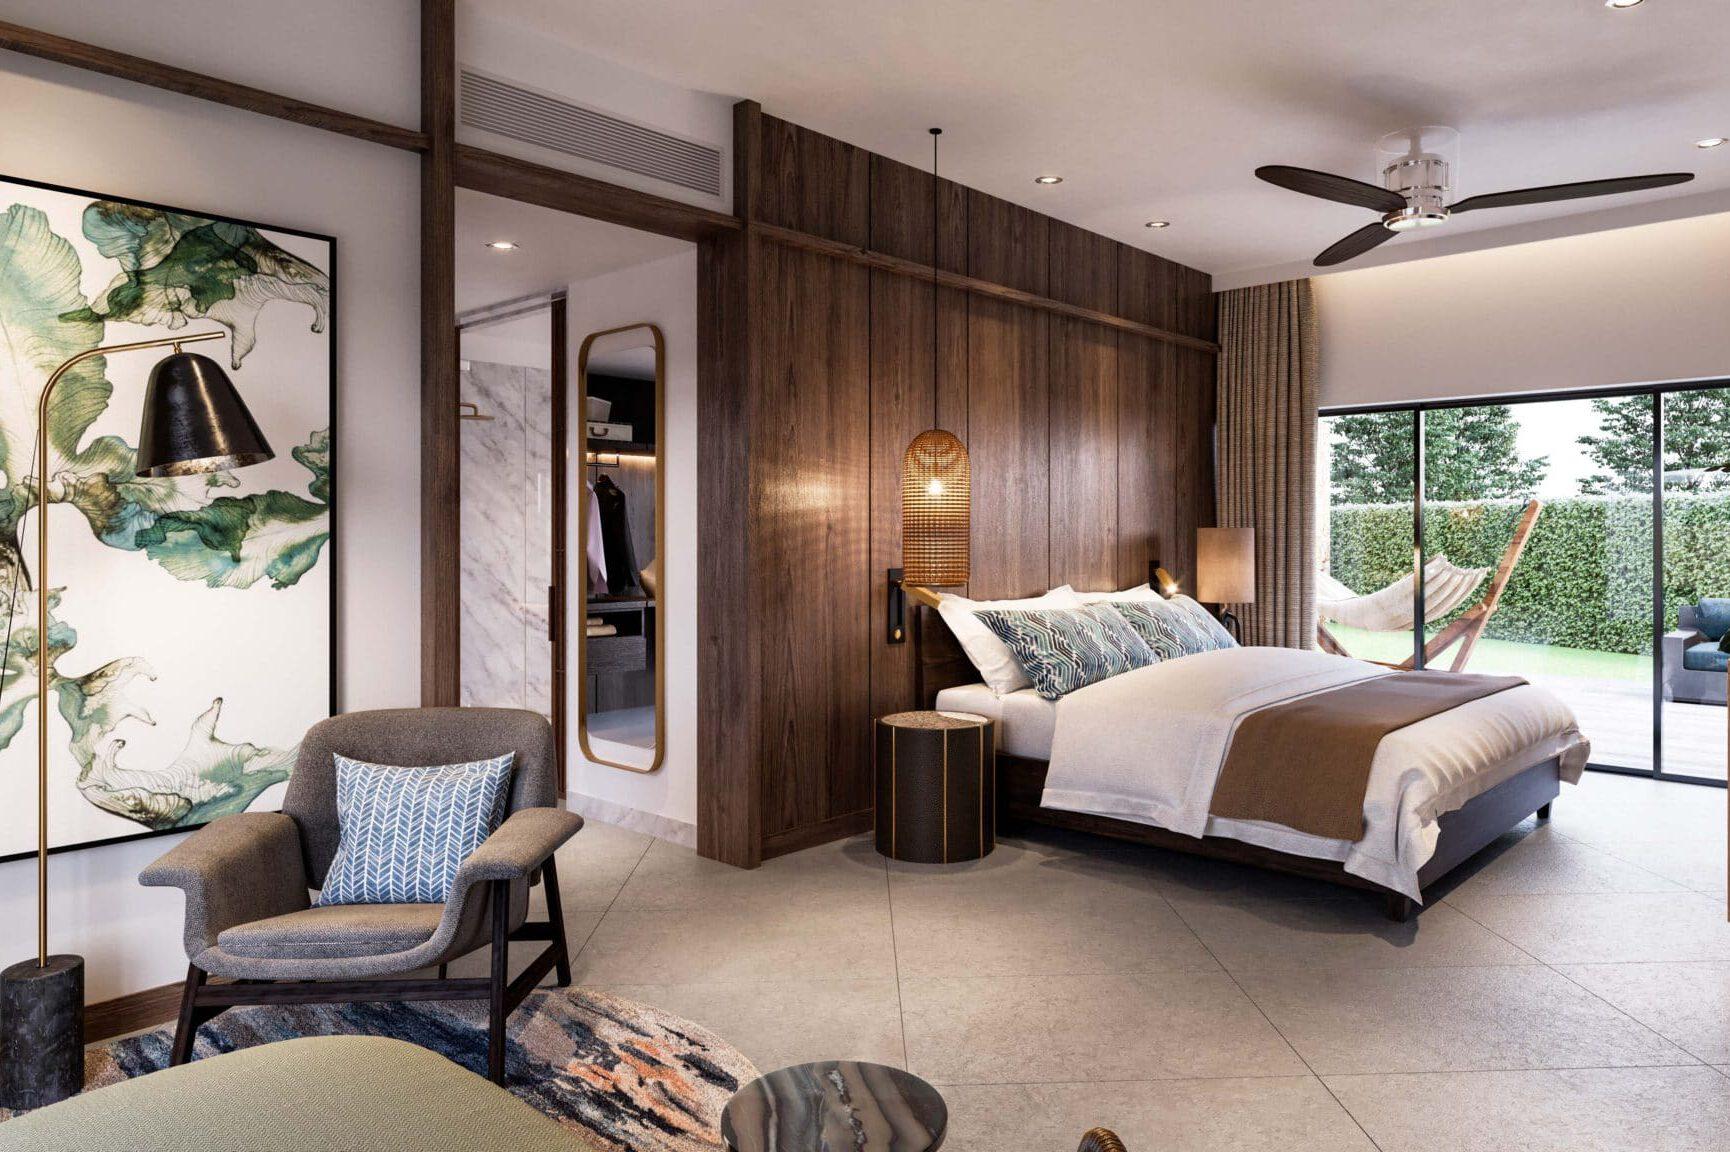 CARMEL FOREST SPA & RESORT HOTEL ISROTEL